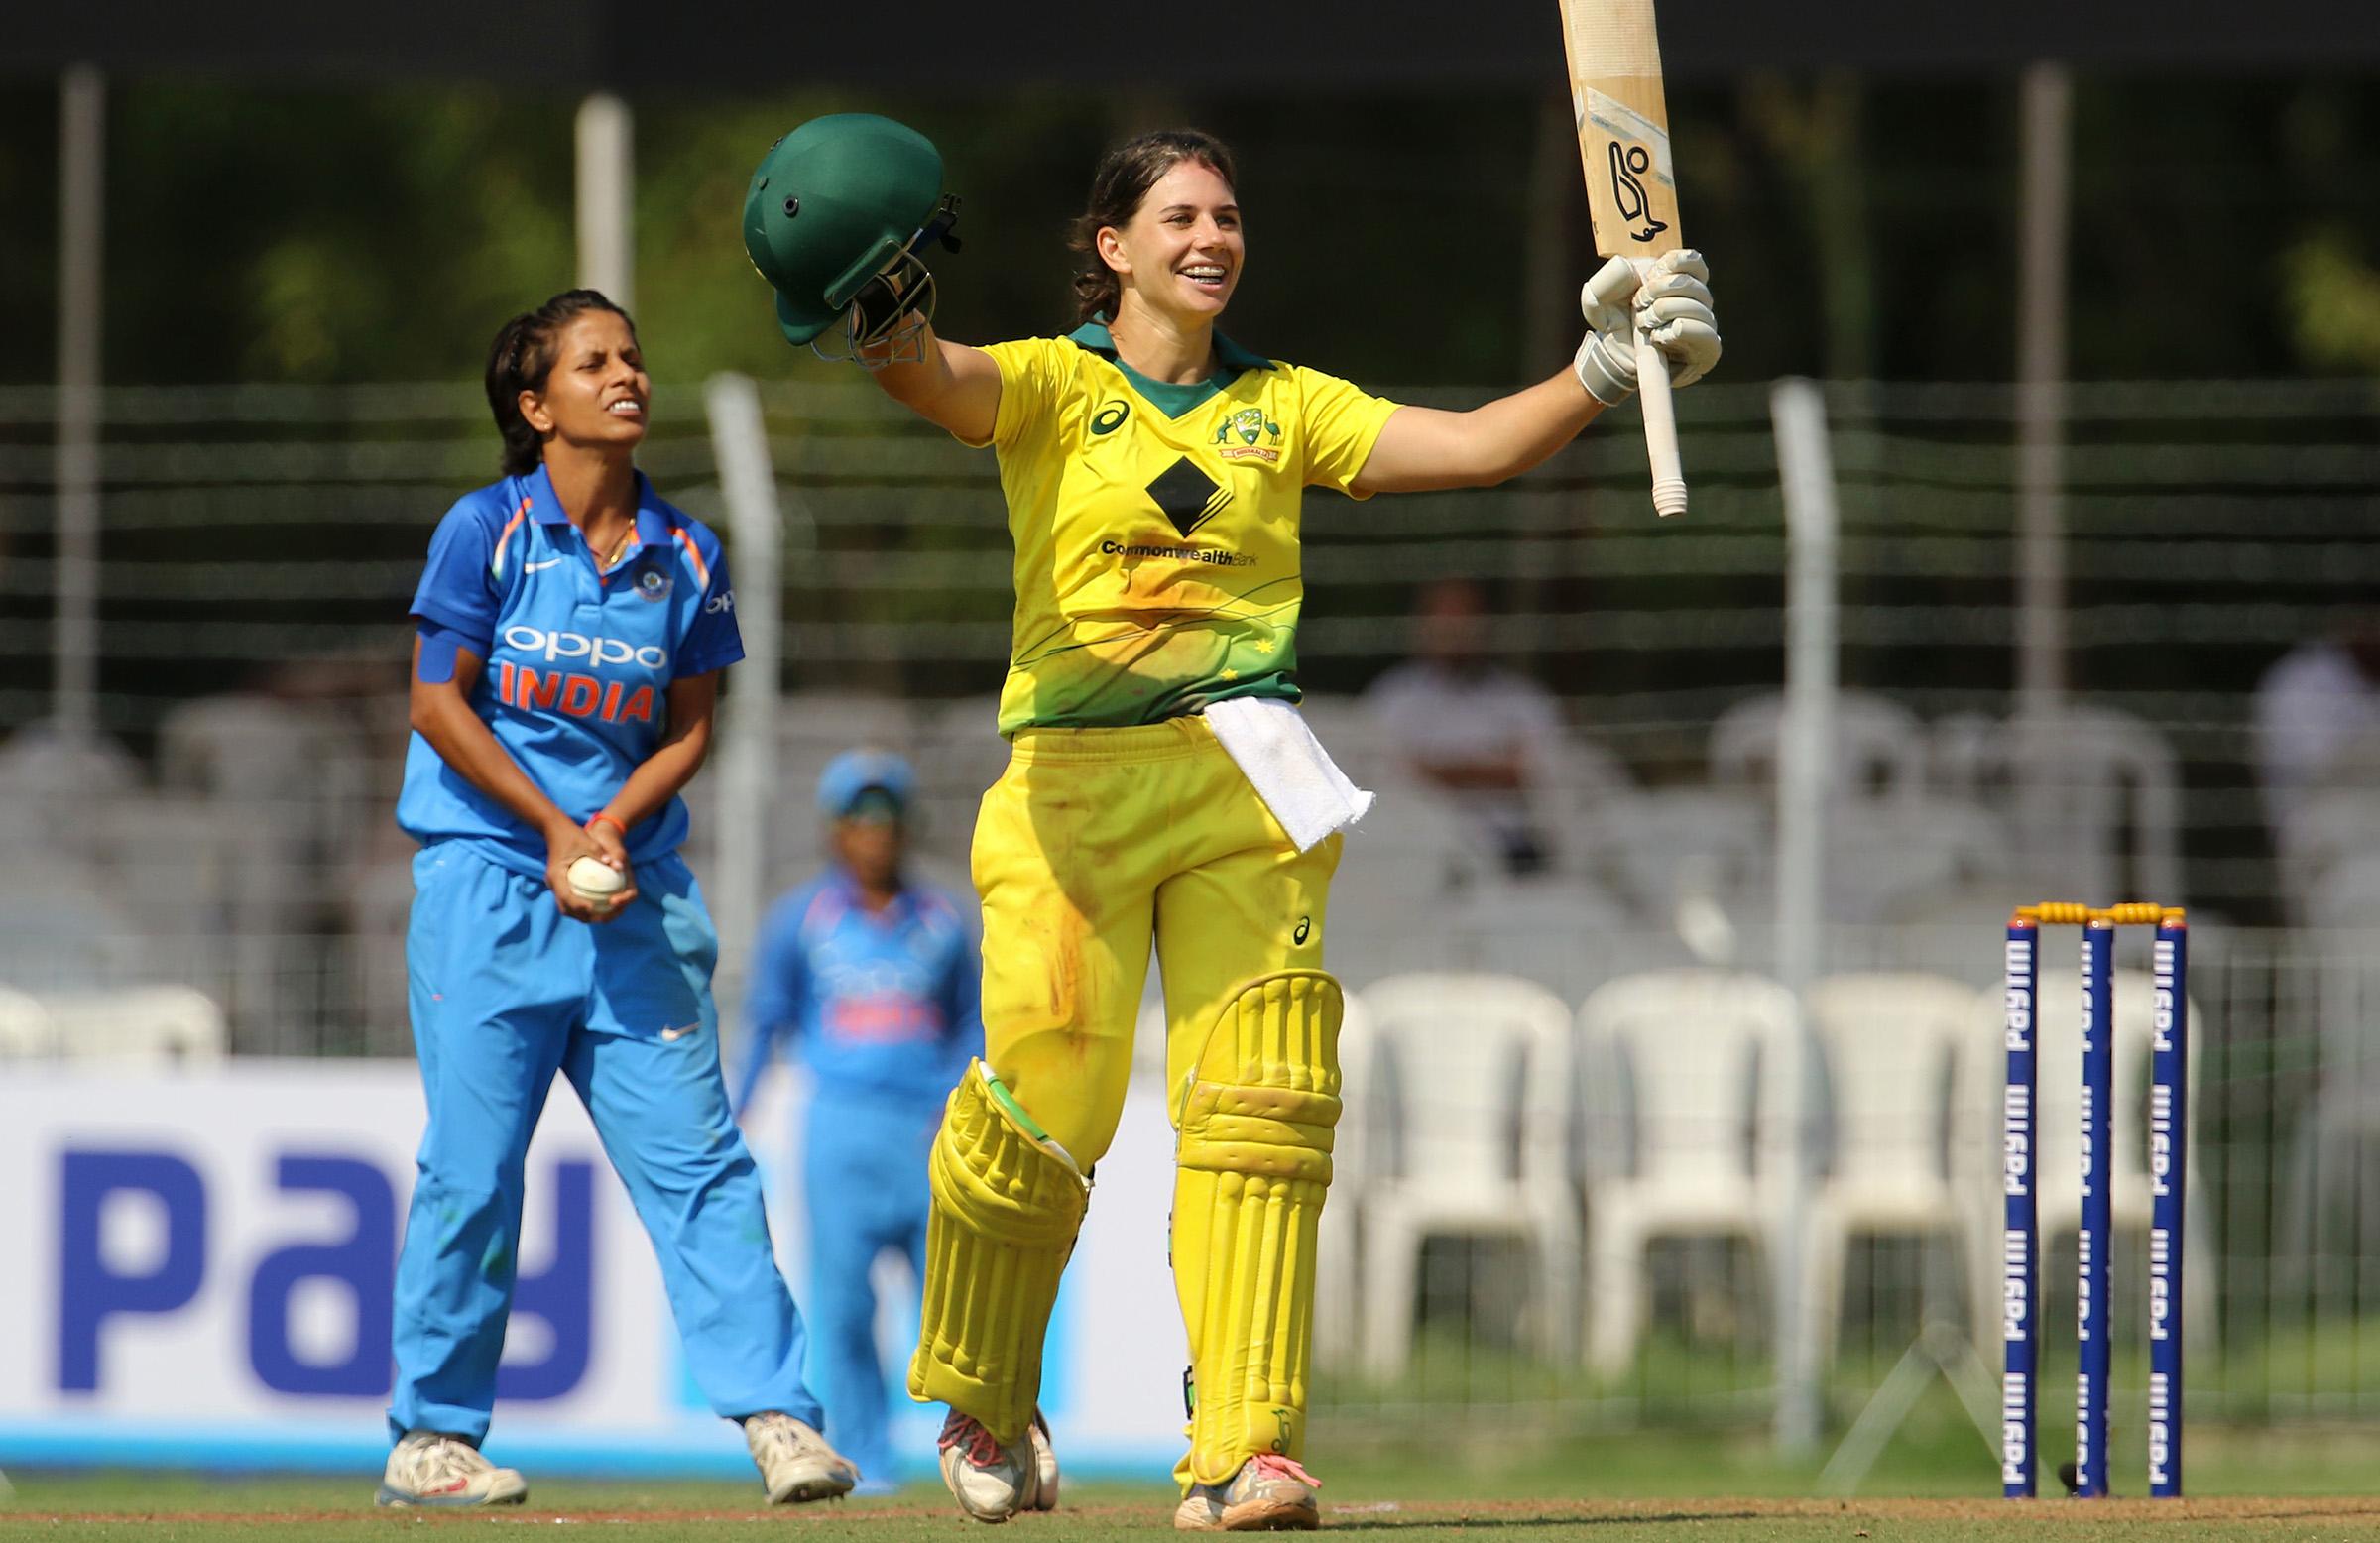 Bolton celebrates her fourth ODI ton // BCCI